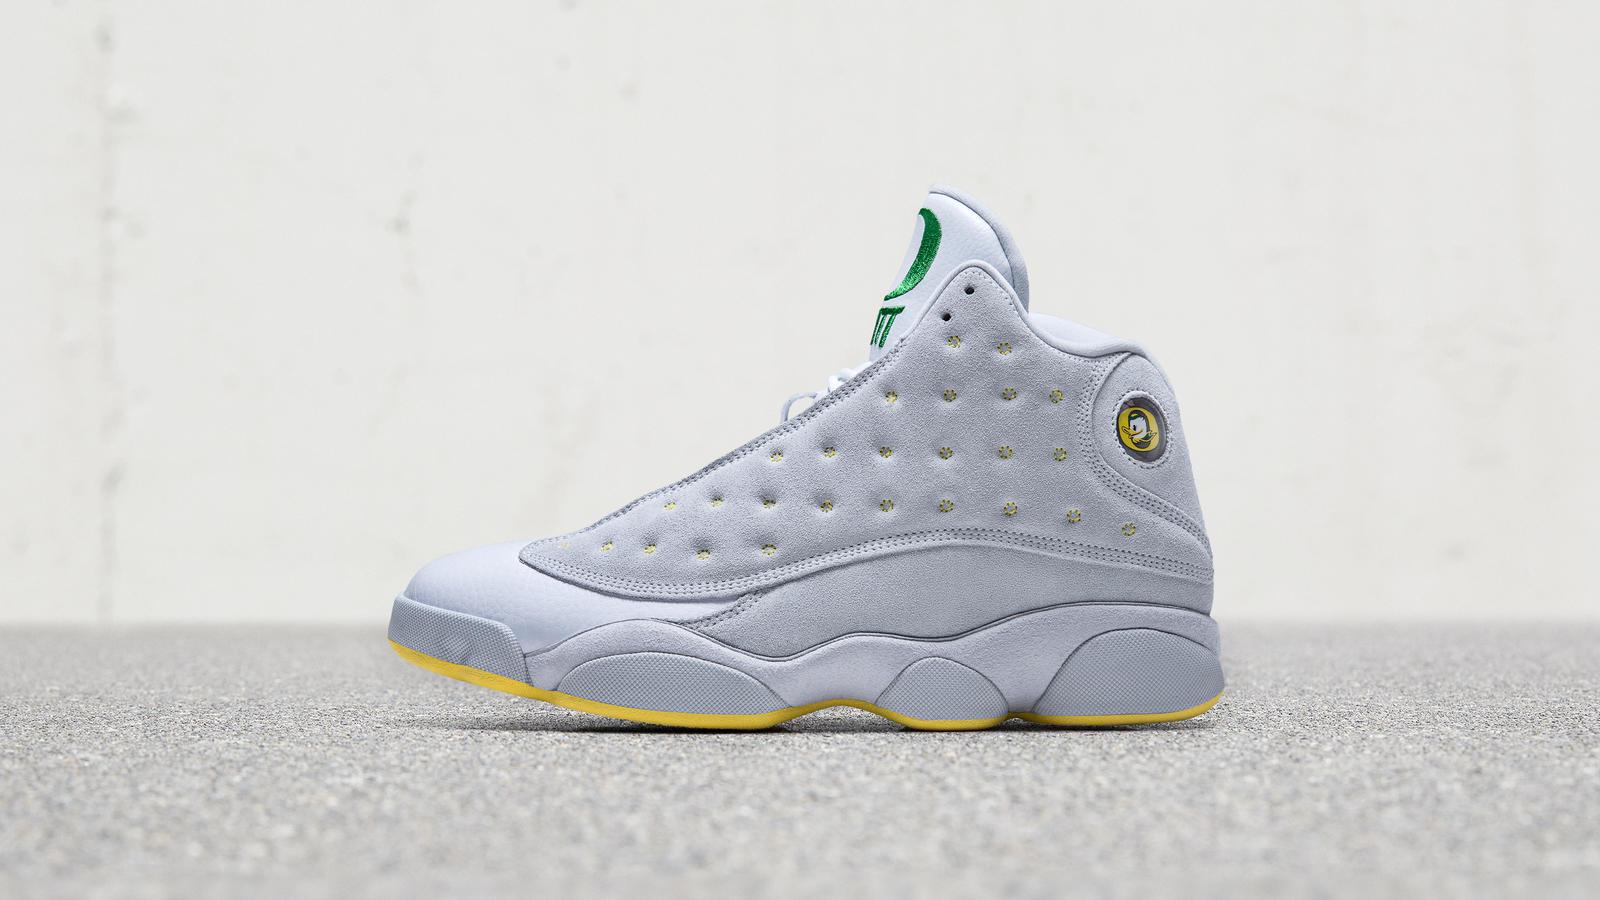 jordan xiii shoes